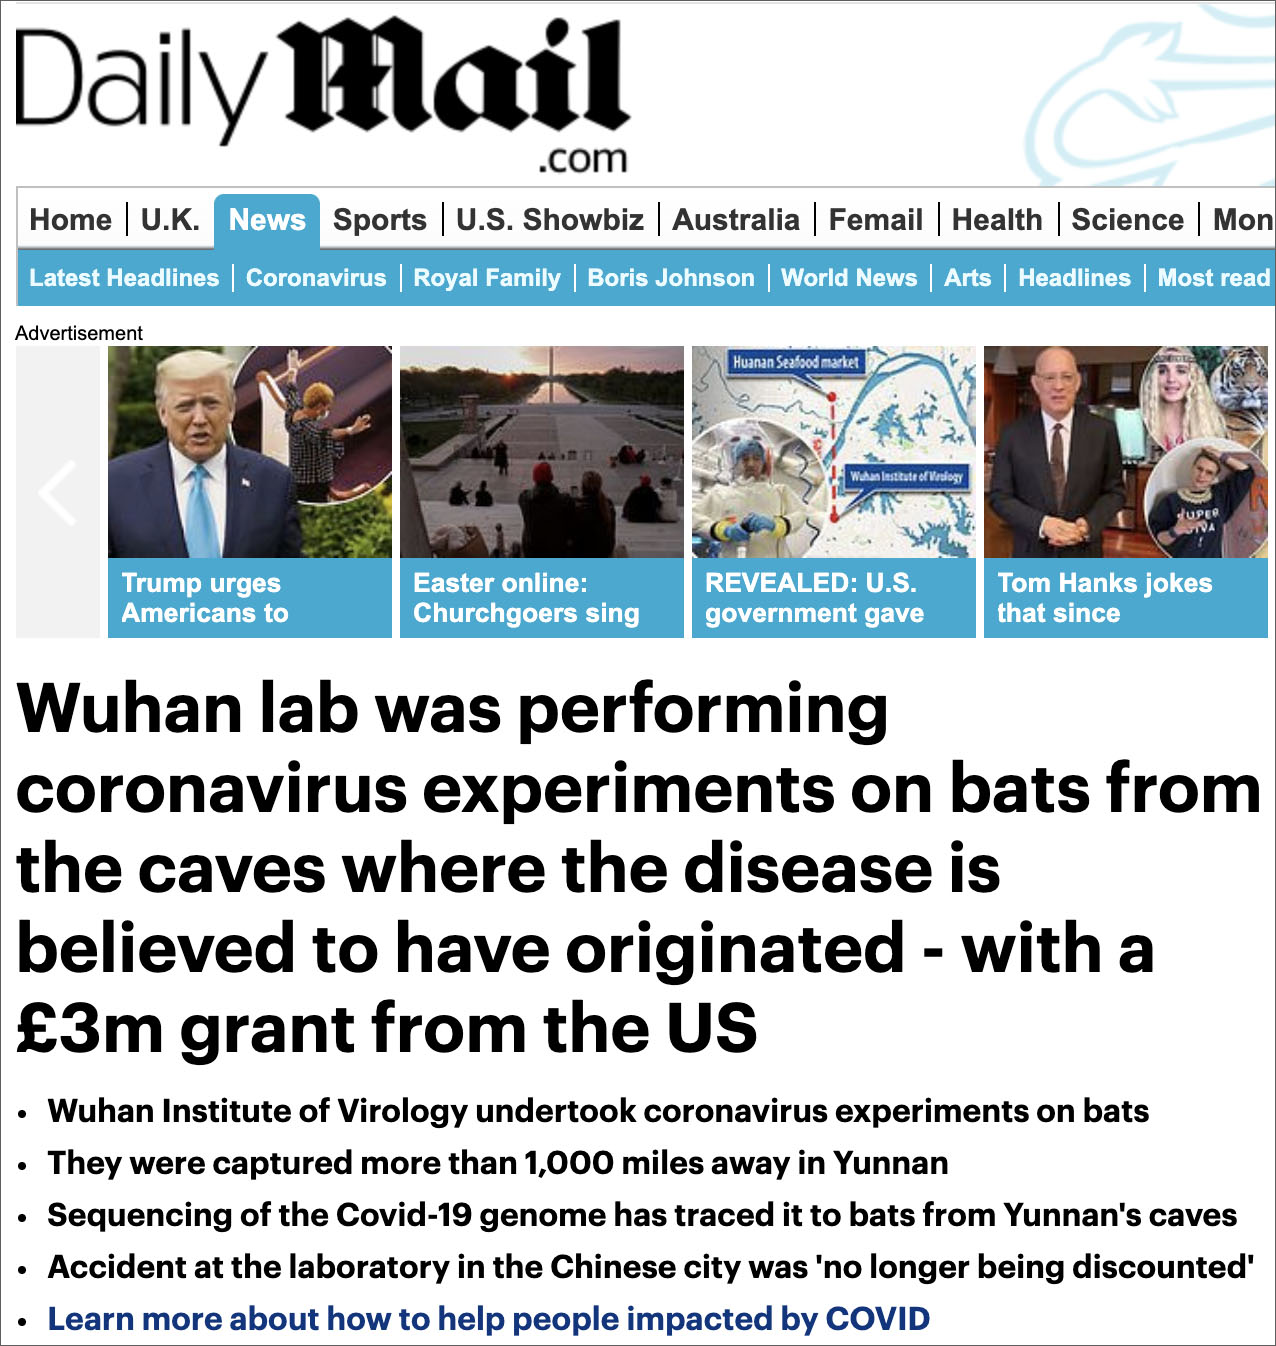 Global Bombshell: China Admits To Harvesting & Testing COVID-19-Like Coronaviruses At Wuhan Lab